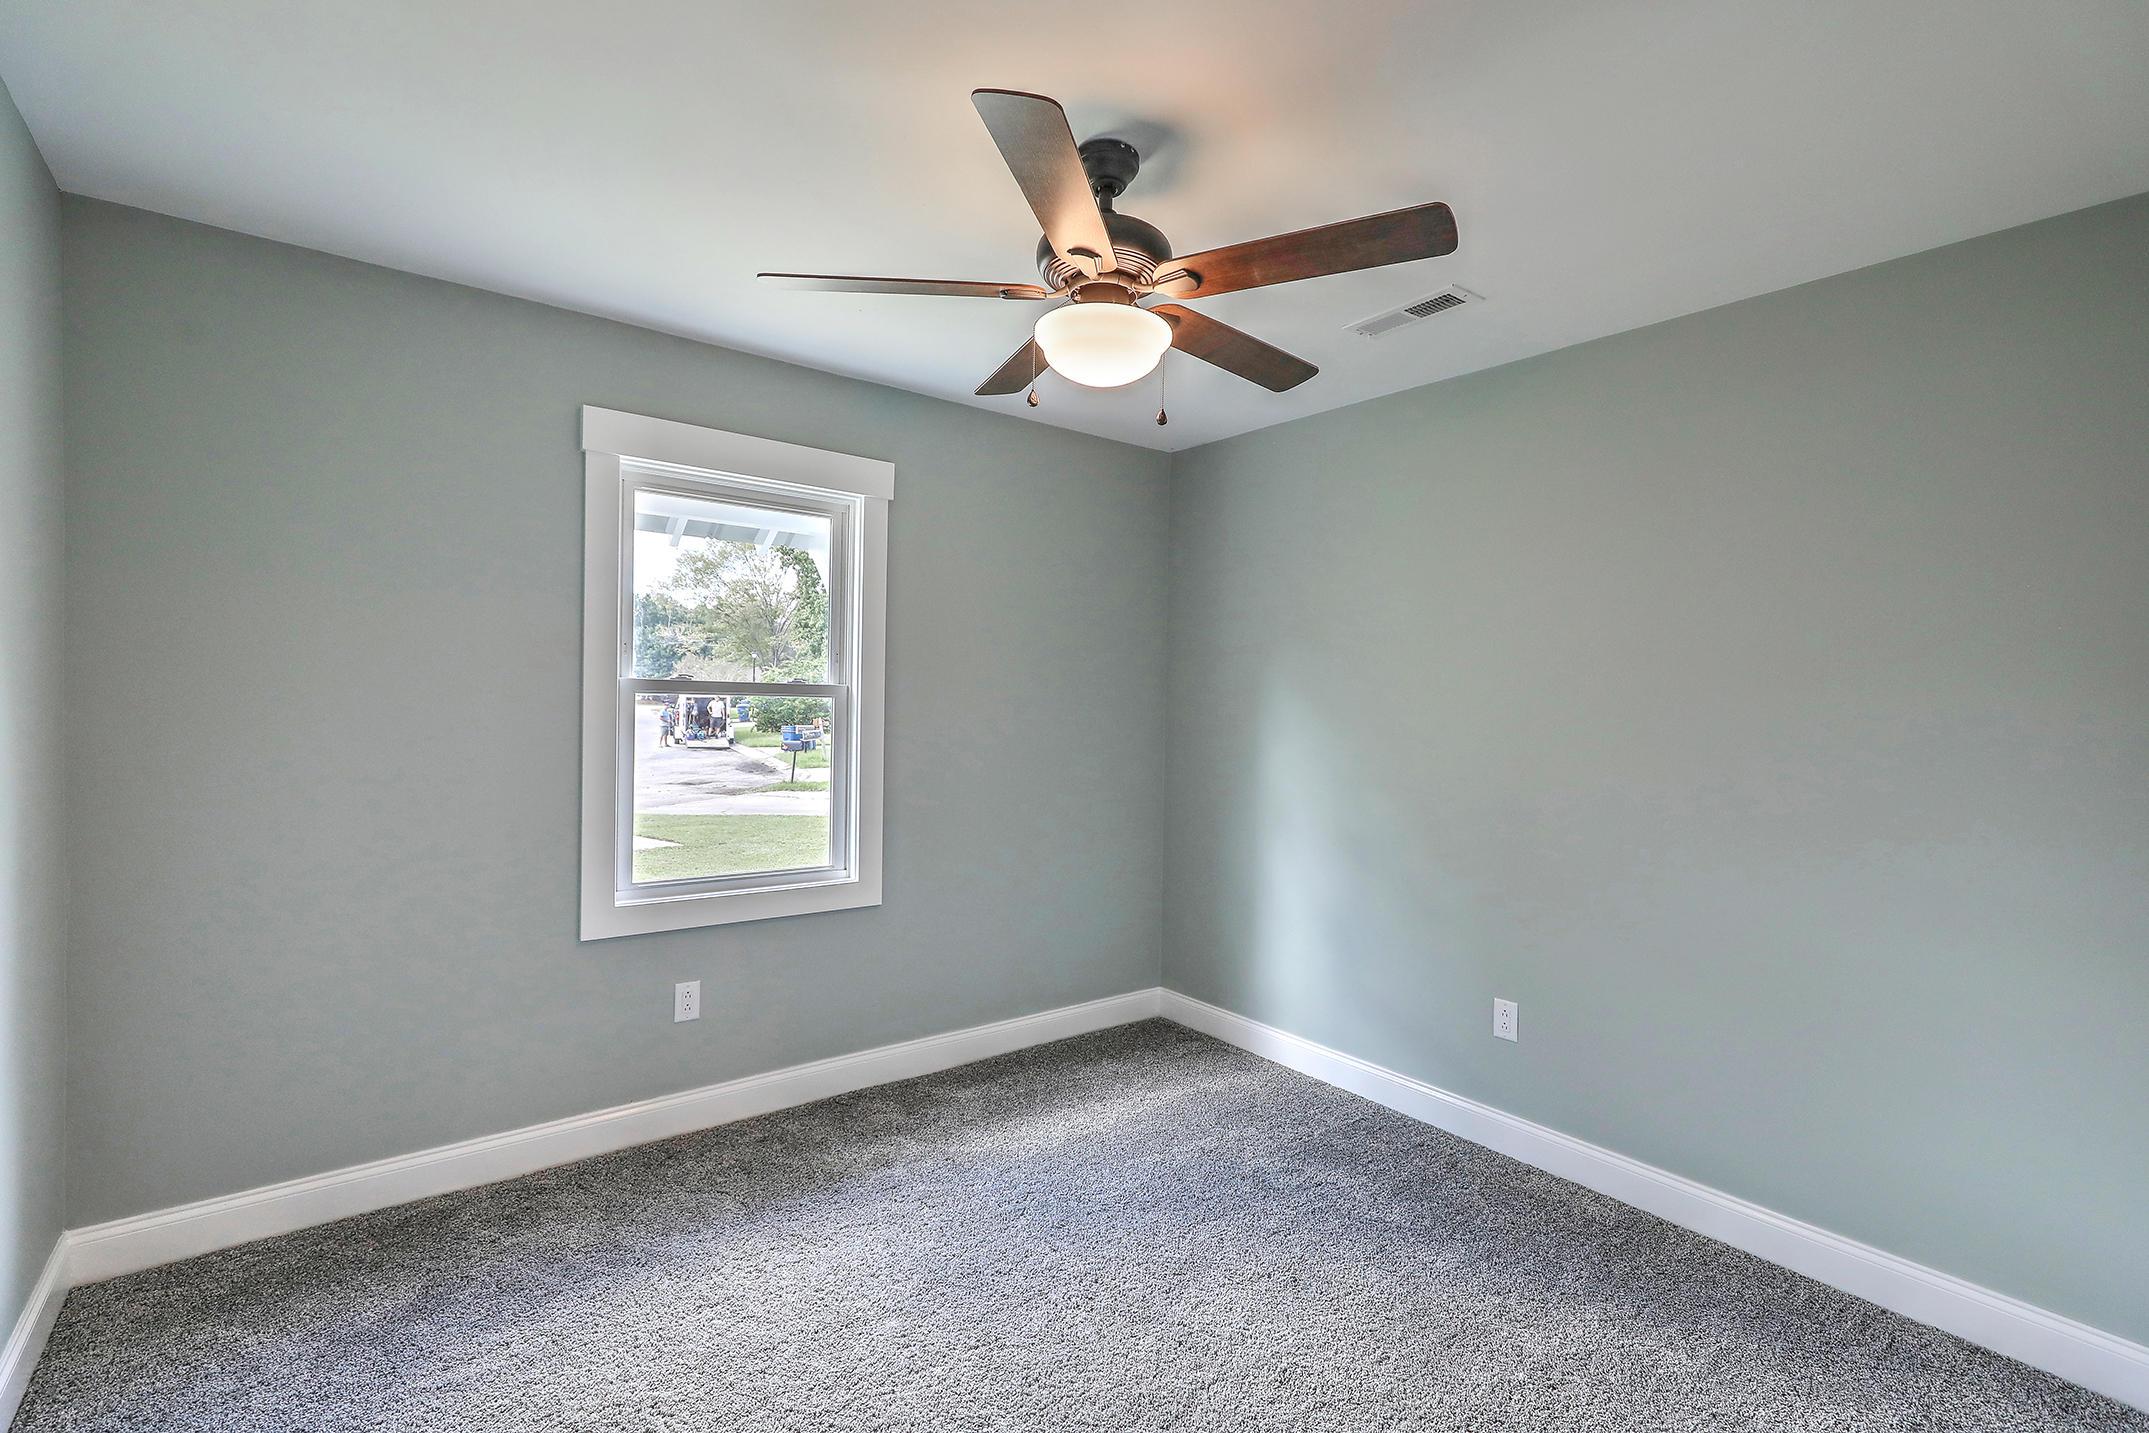 Bruno Acres Homes For Sale - 1674 Durkee, Charleston, SC - 16